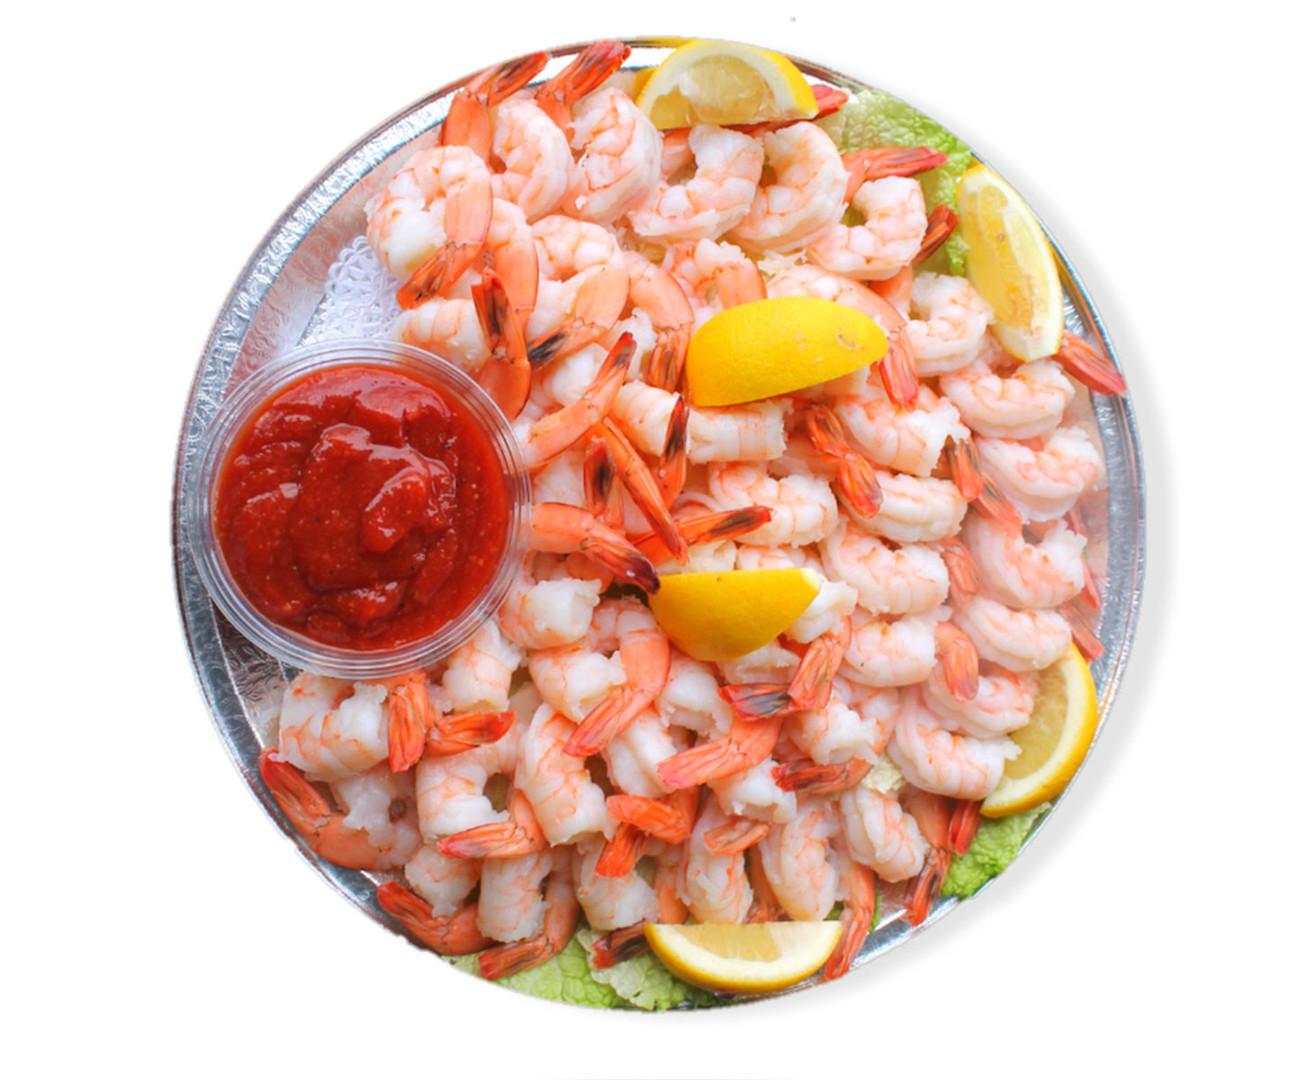 party-platter-shrimpCocktail.jpg